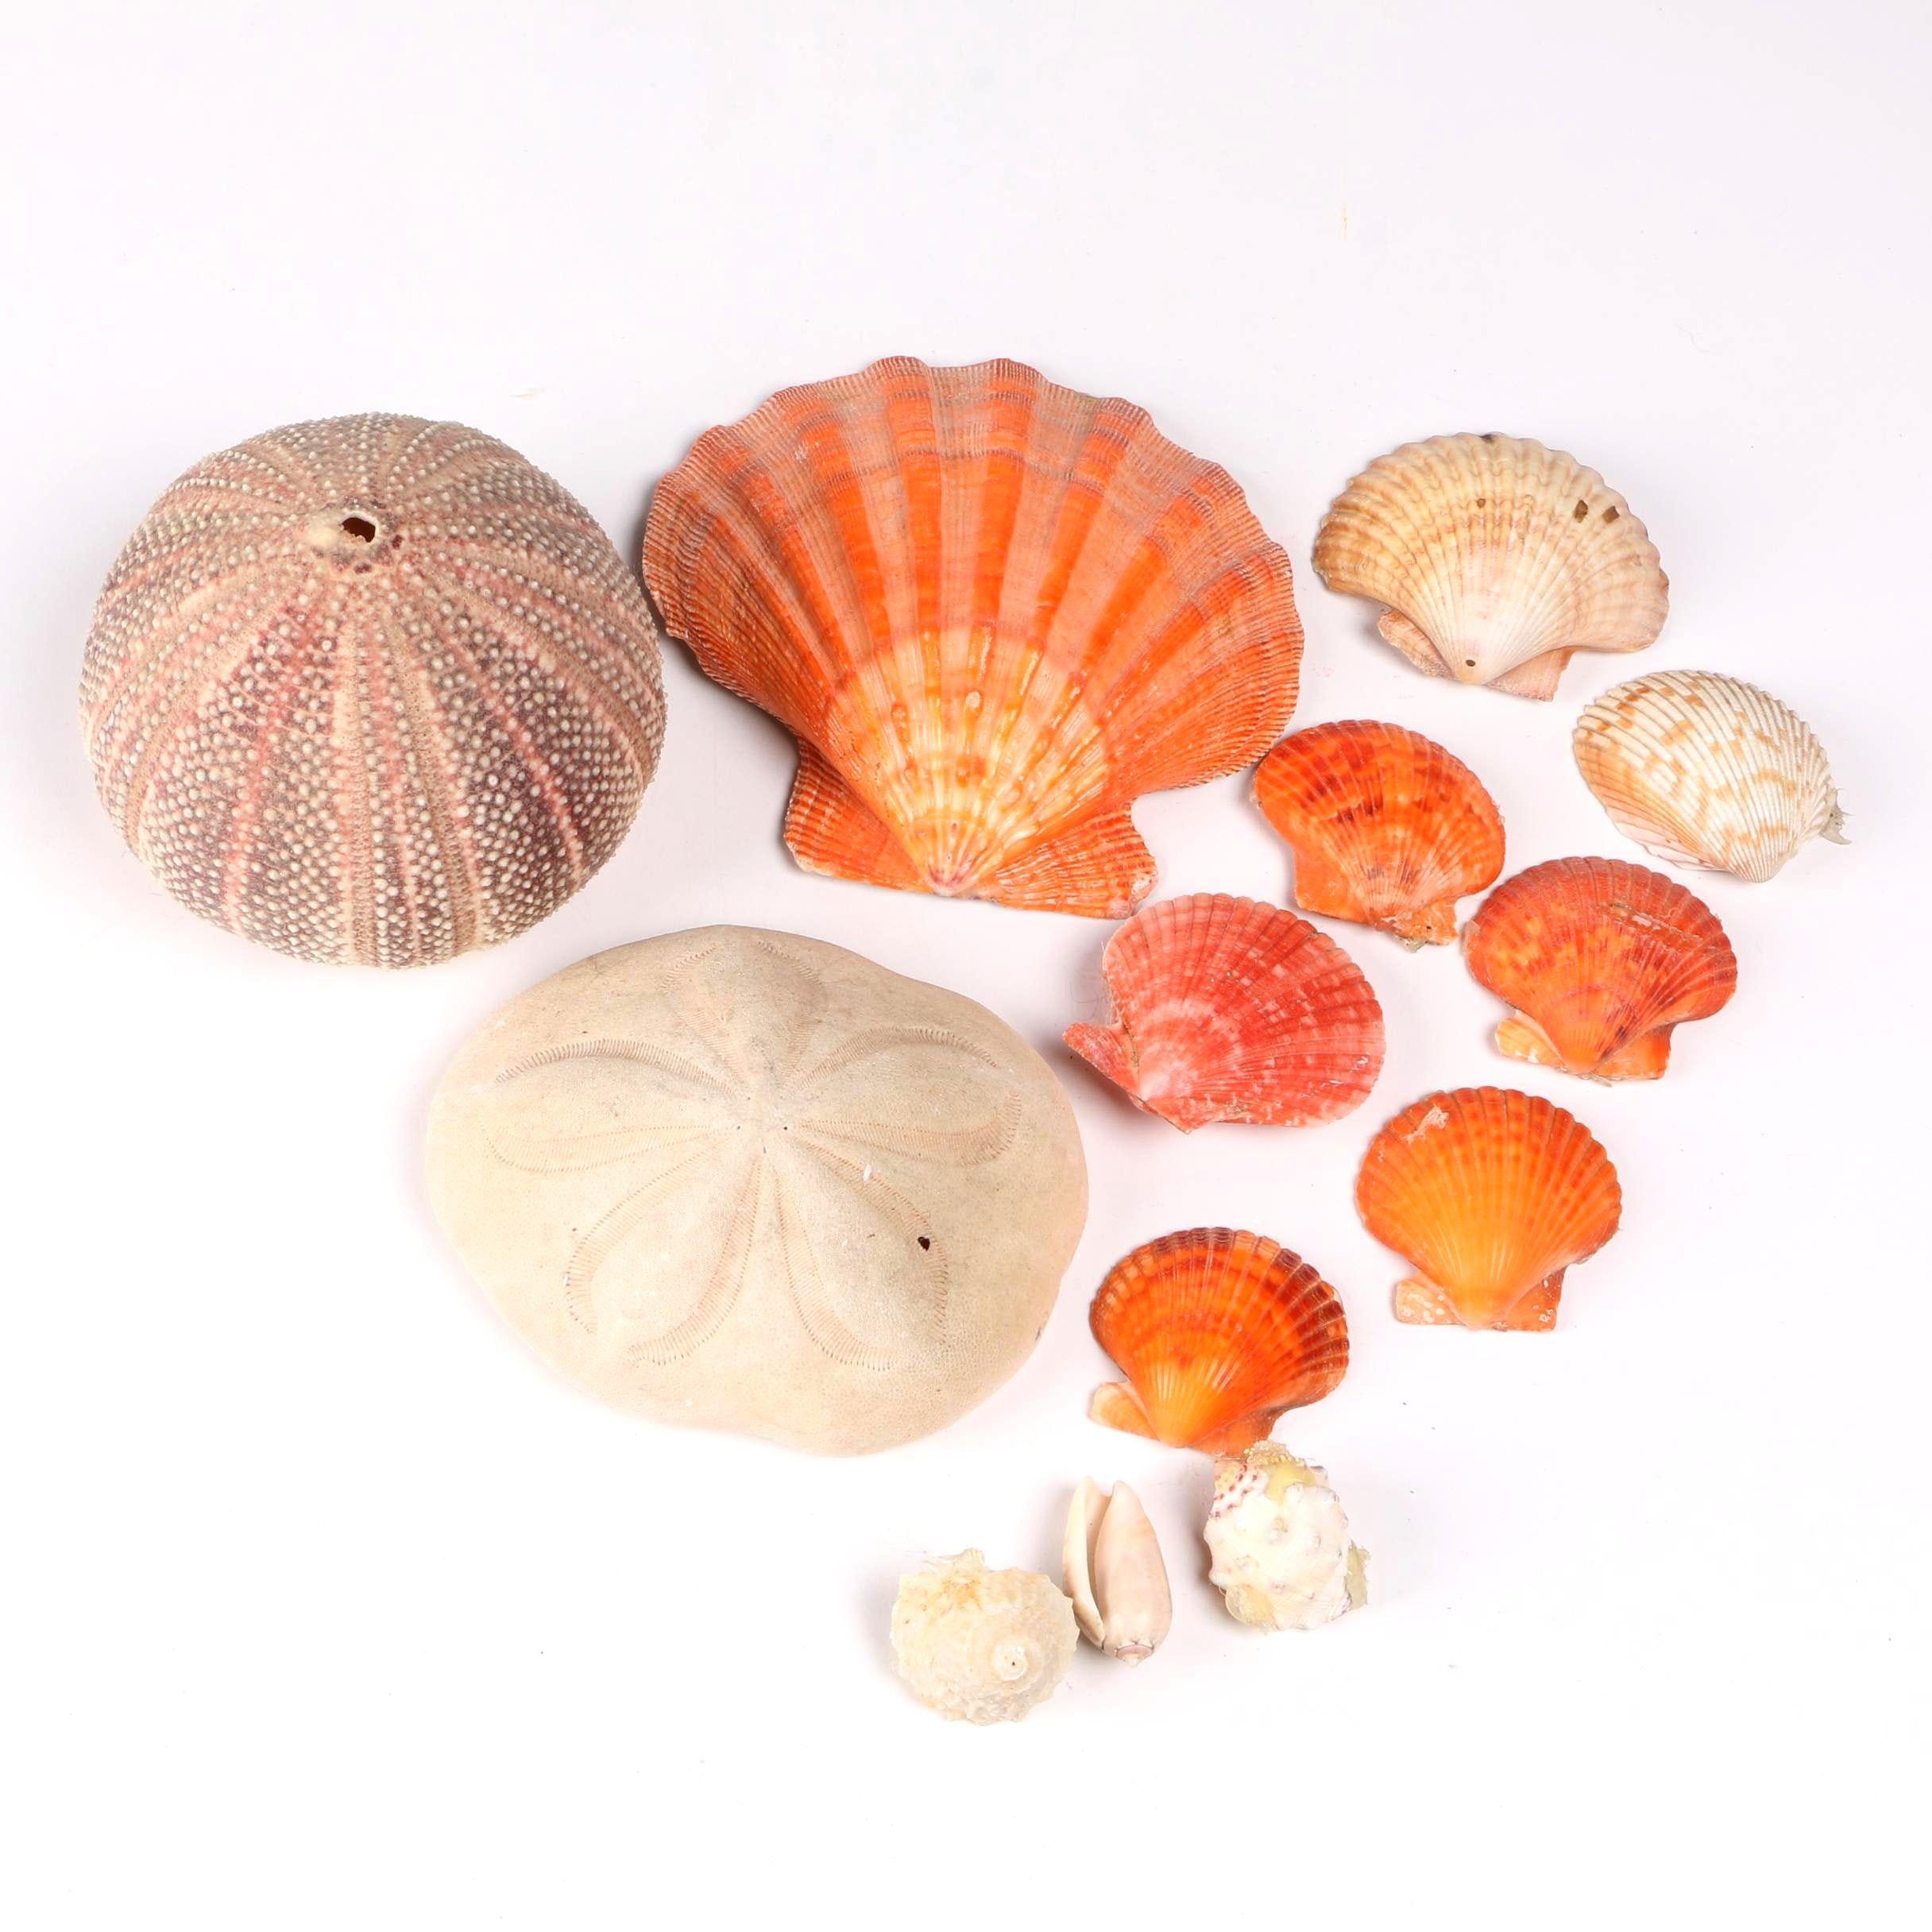 Recent Marine Fossil Specimens